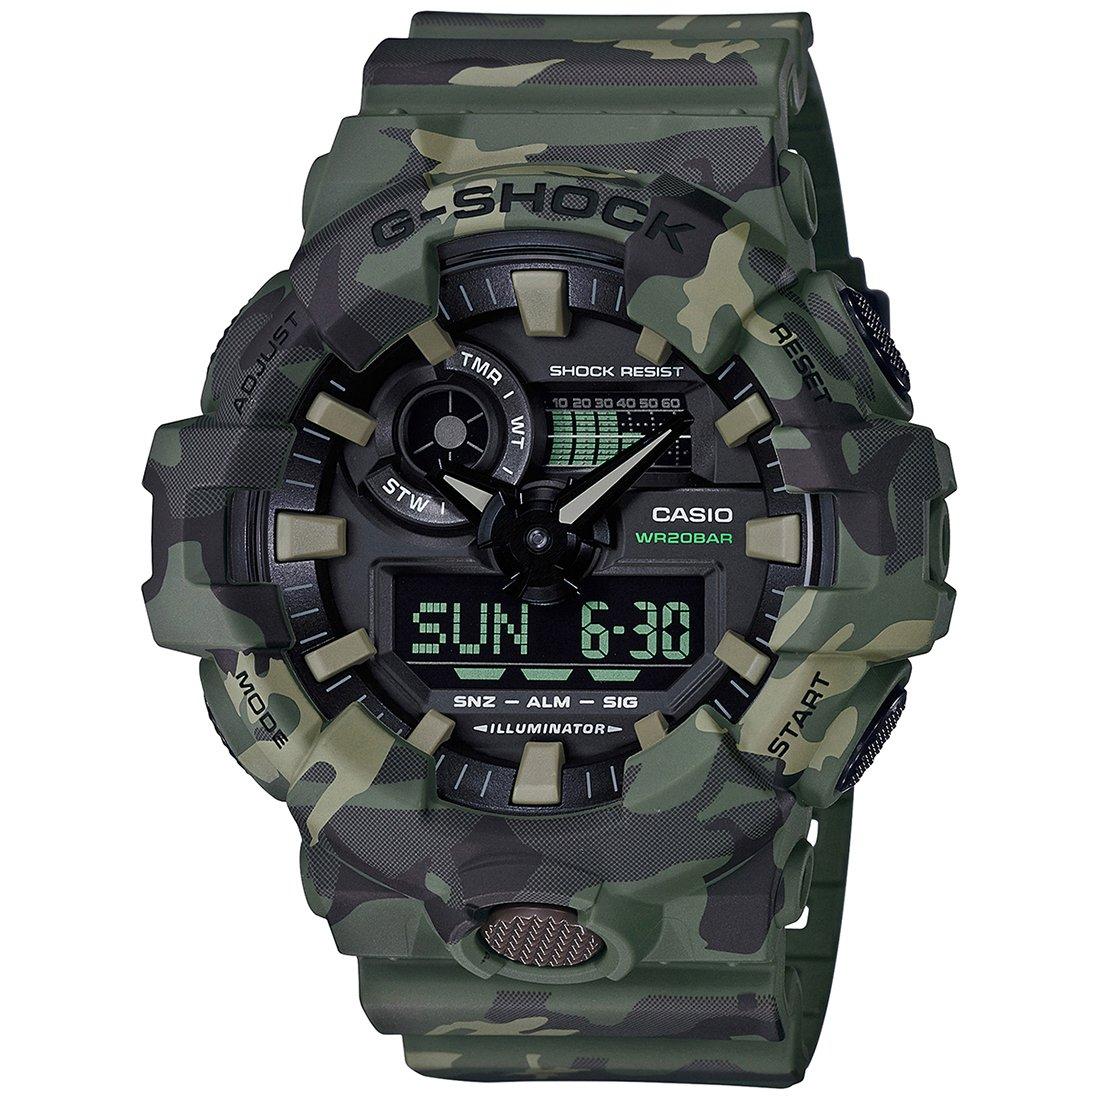 Shock Proof Watch